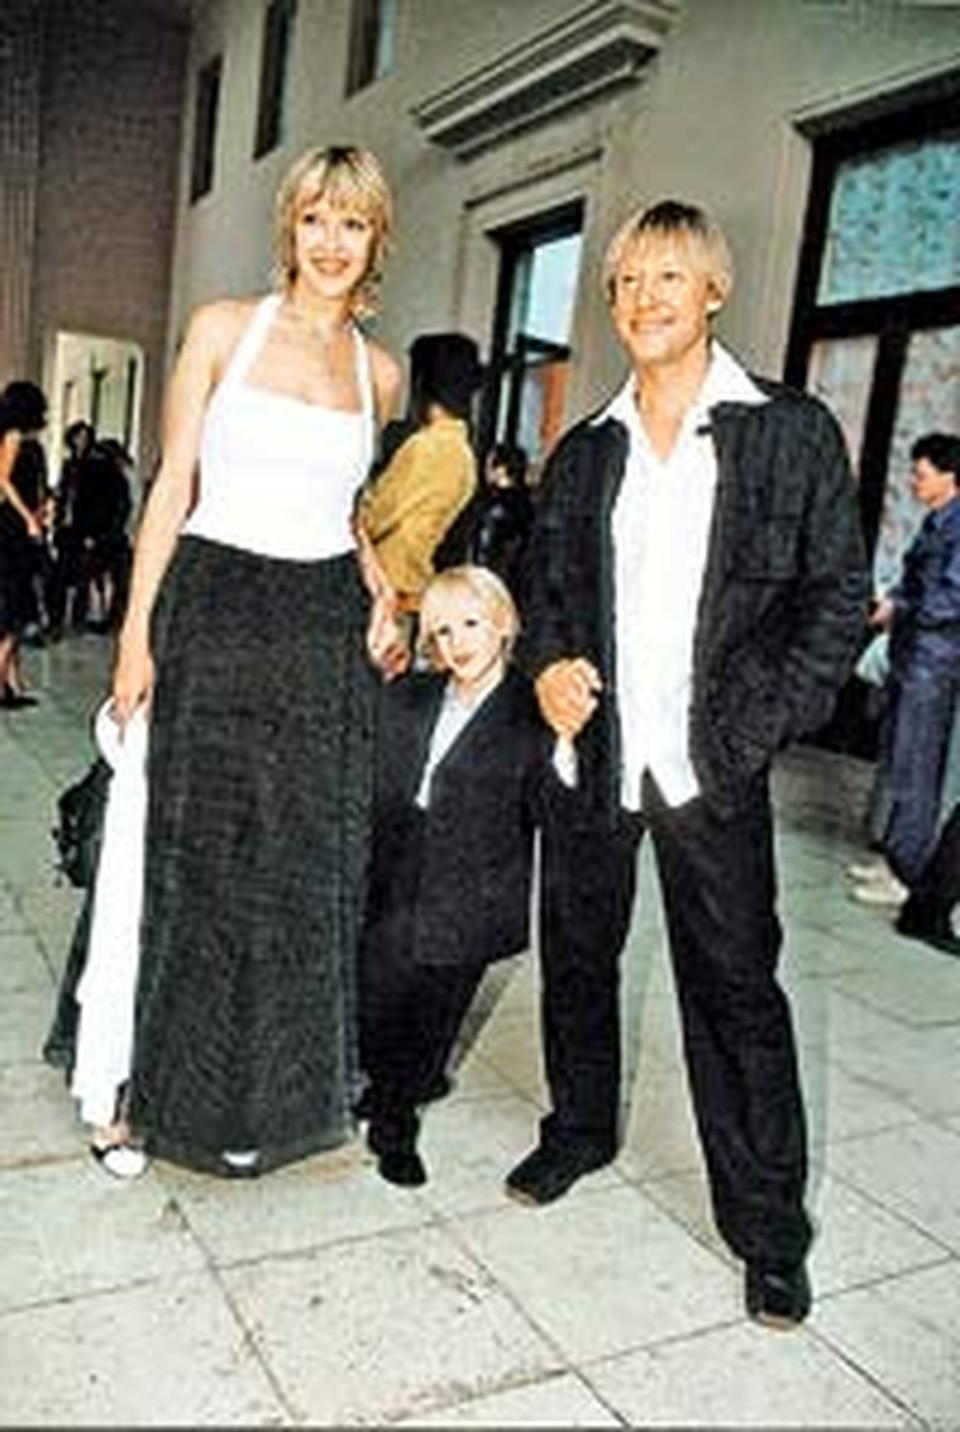 Шестилетний Ваня Харатьян растет таким же улыбчивым, как мама Марина и папа Дима.